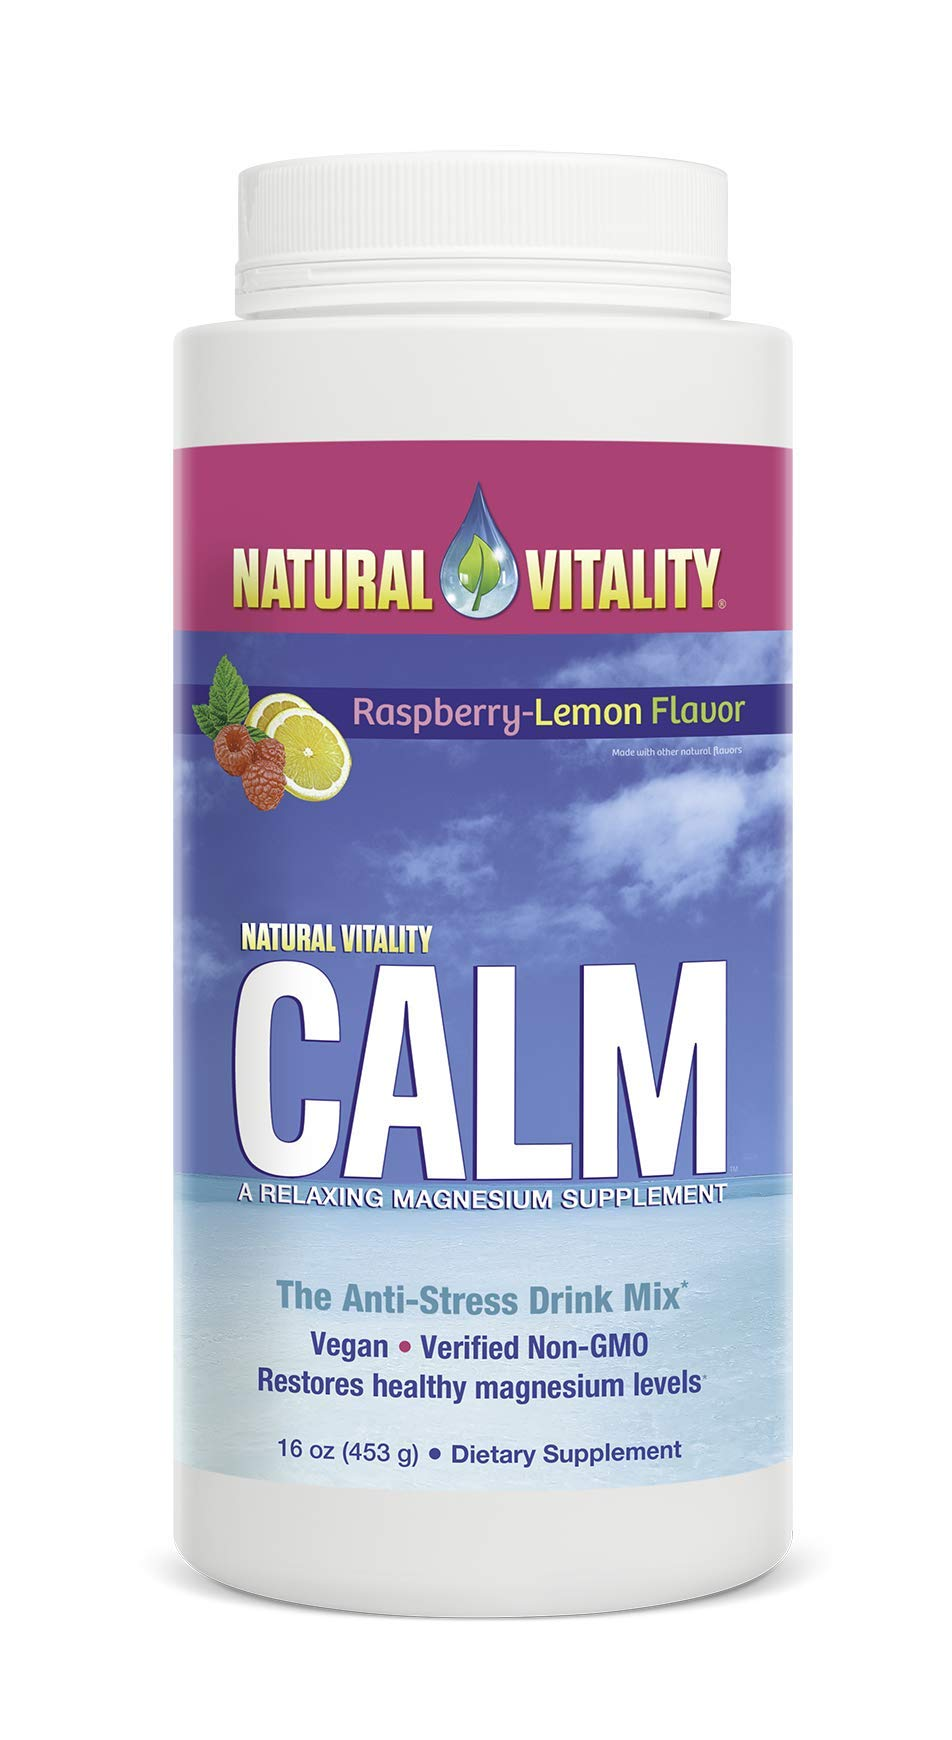 Natural Vitality Calm, The Anti-Stress Dietary Supplement Powder, Raspberry Lemon - 16ounce